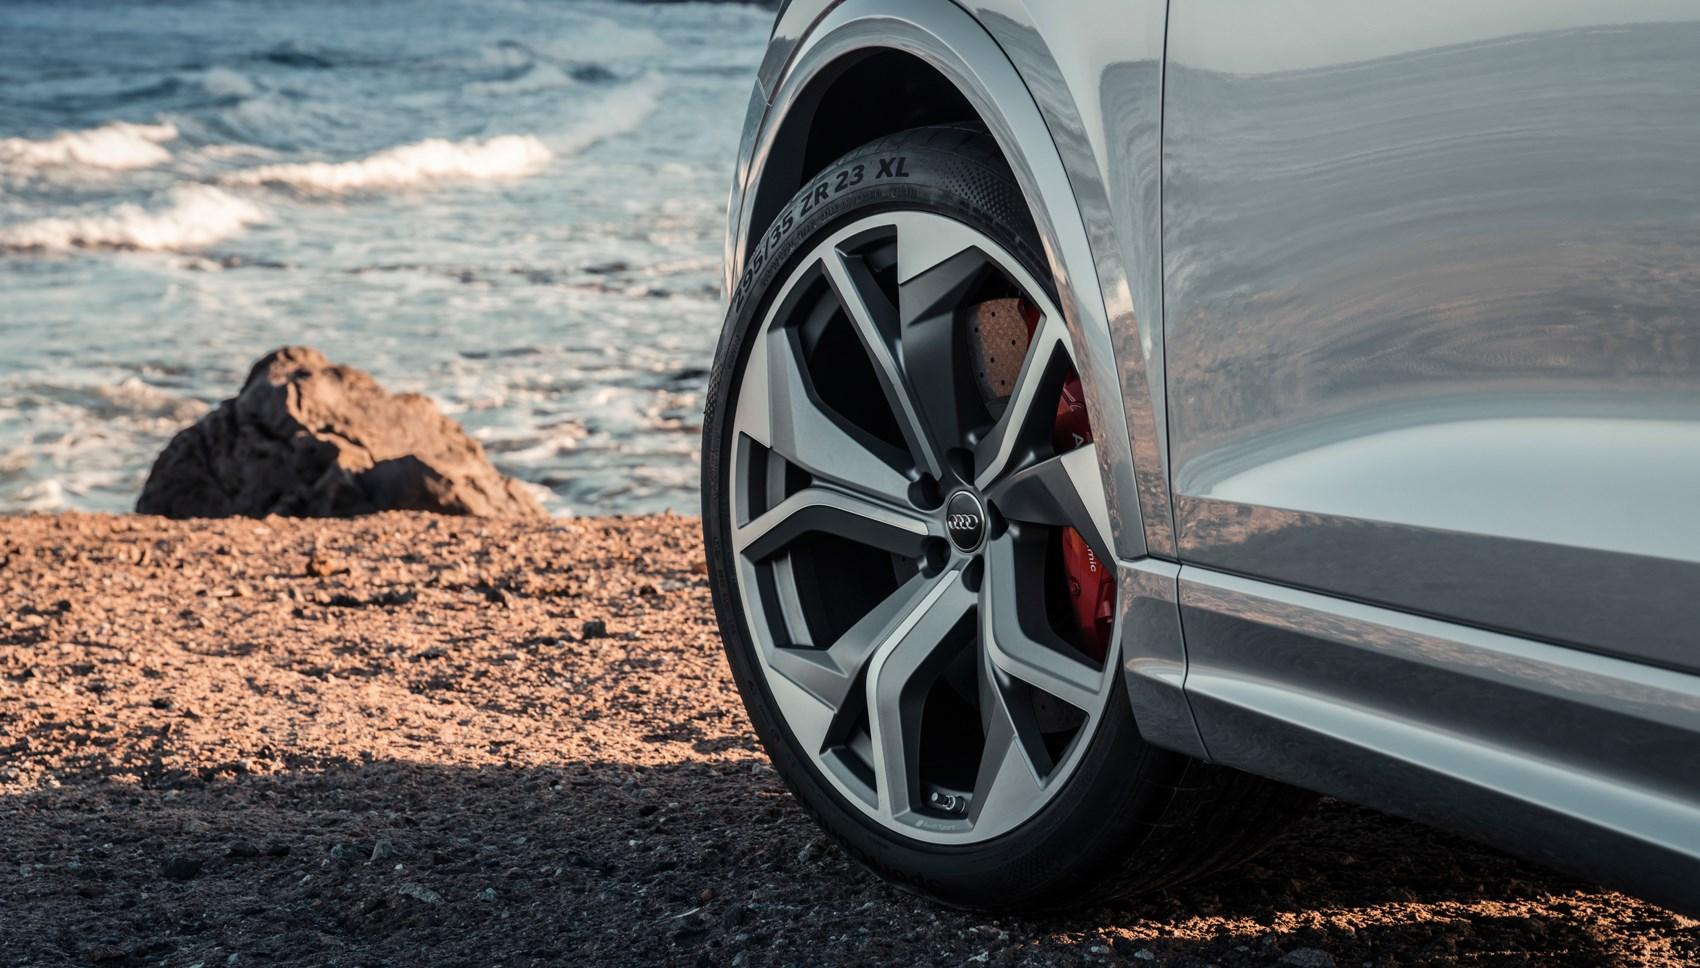 Audi RSQ8 brake